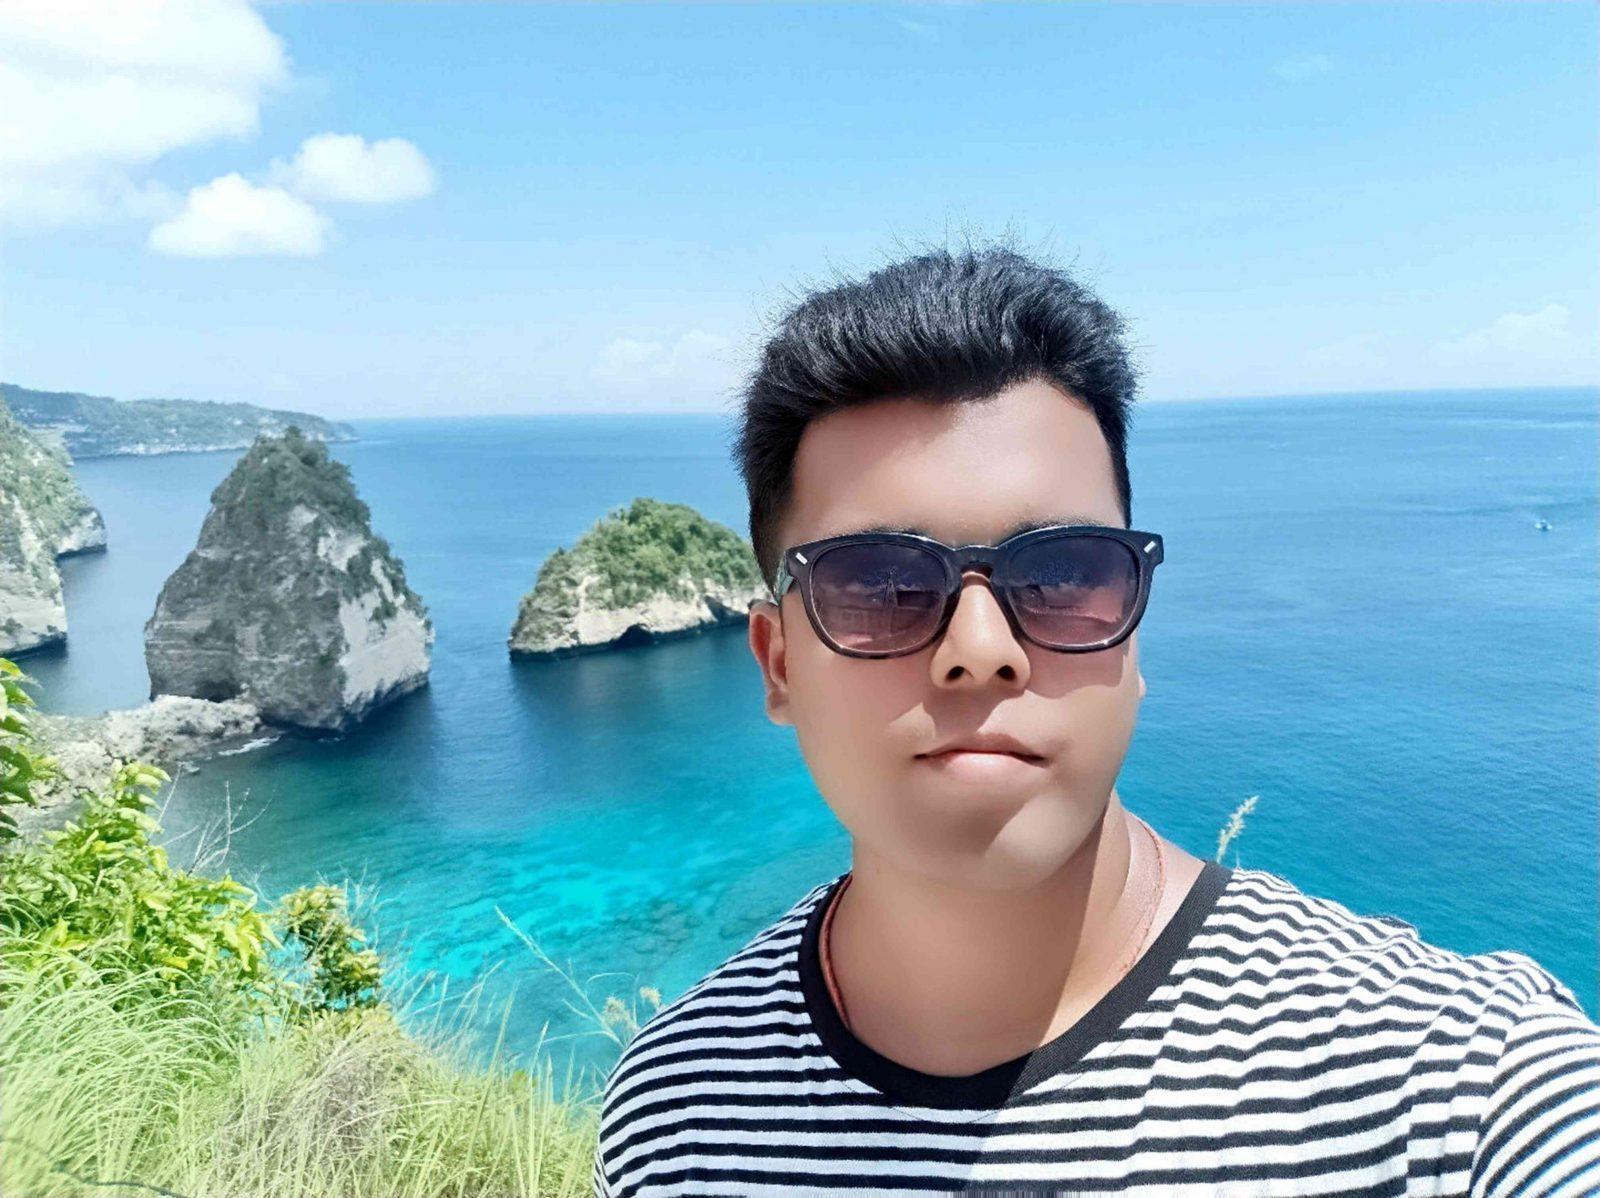 Pranav Das in Bali